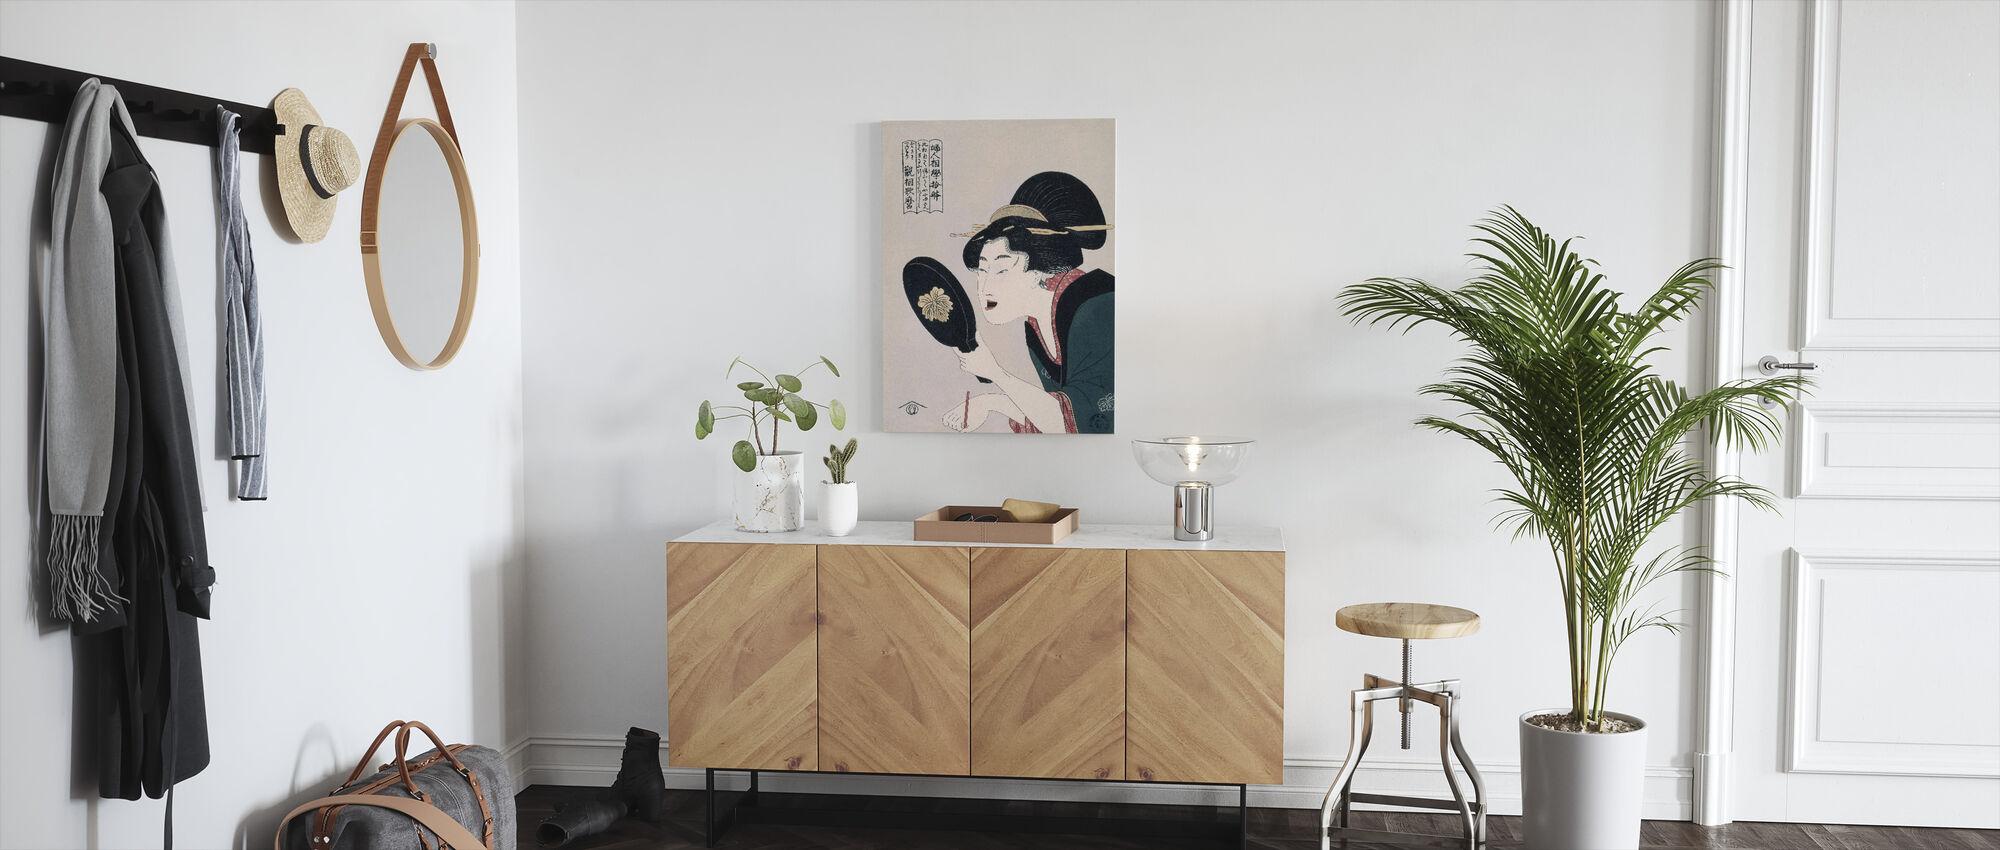 Tsuruya Kimon - Kitagawa Utamaro - Canvas print - Gang